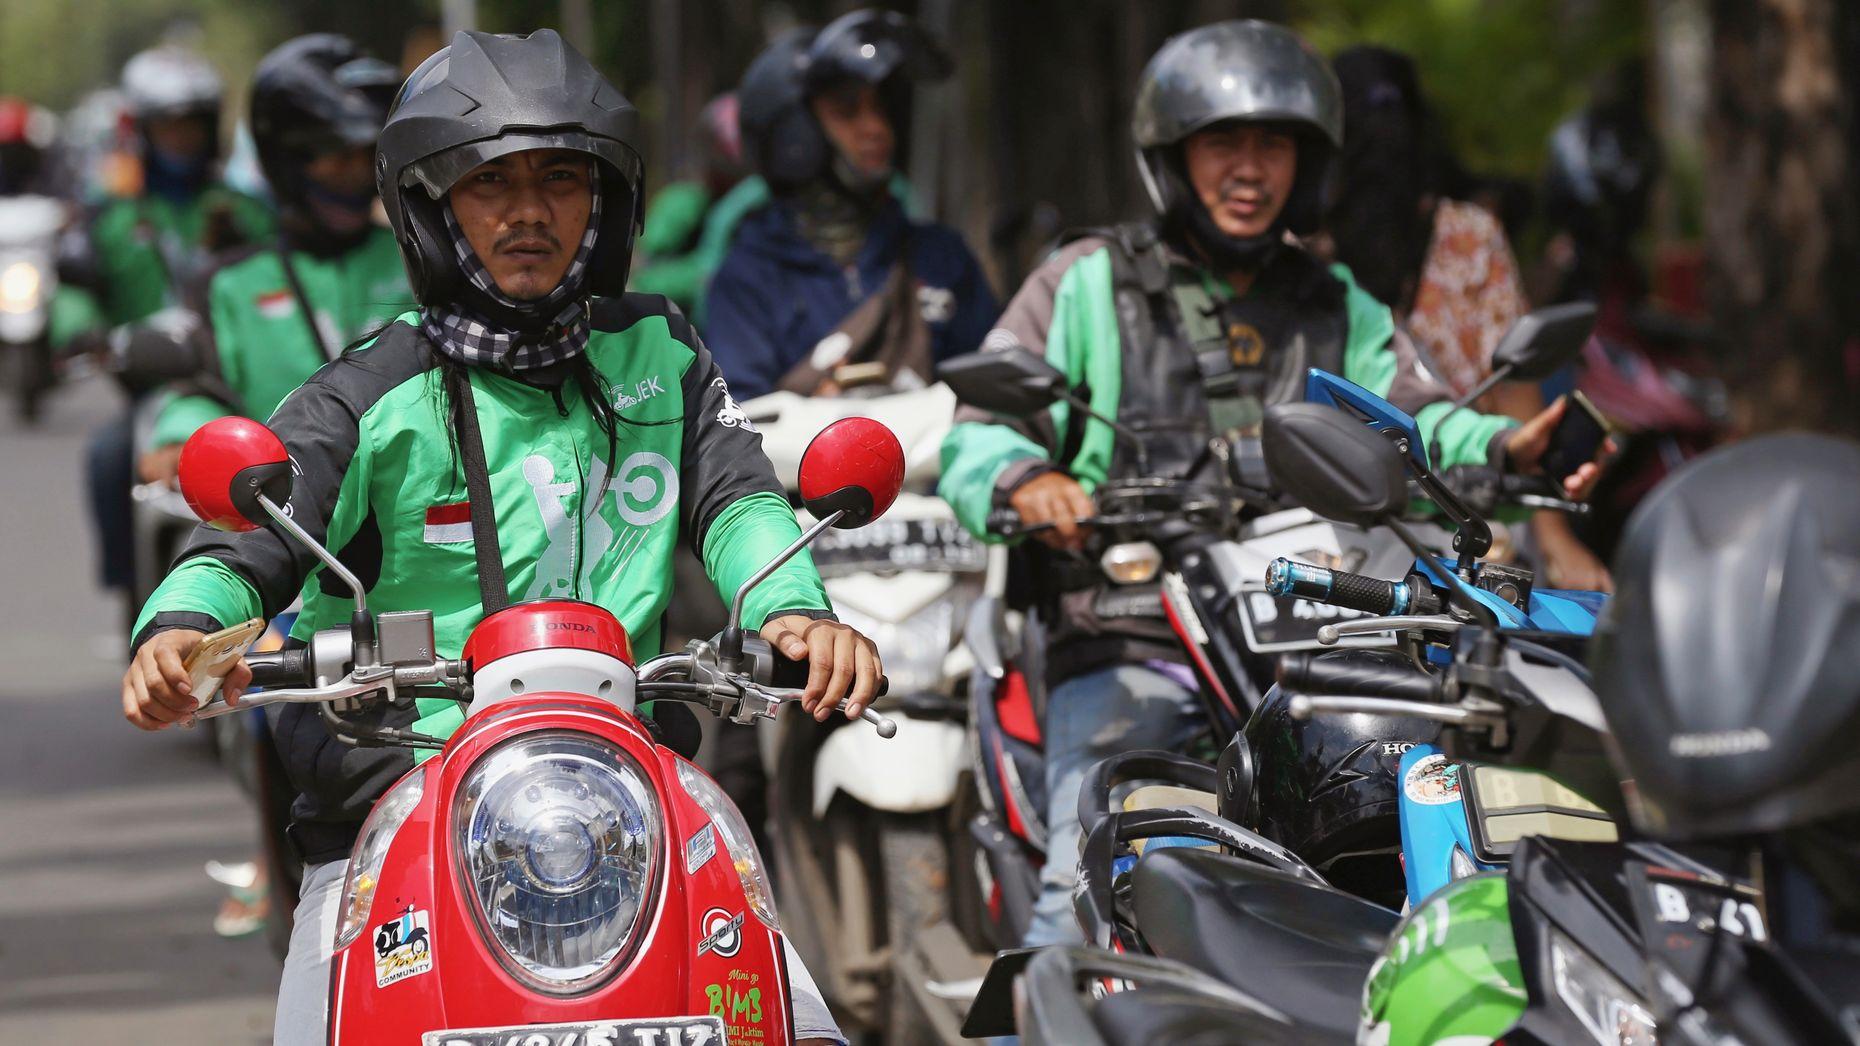 GoJek motorbike riders in Djakarta. Photo by AP